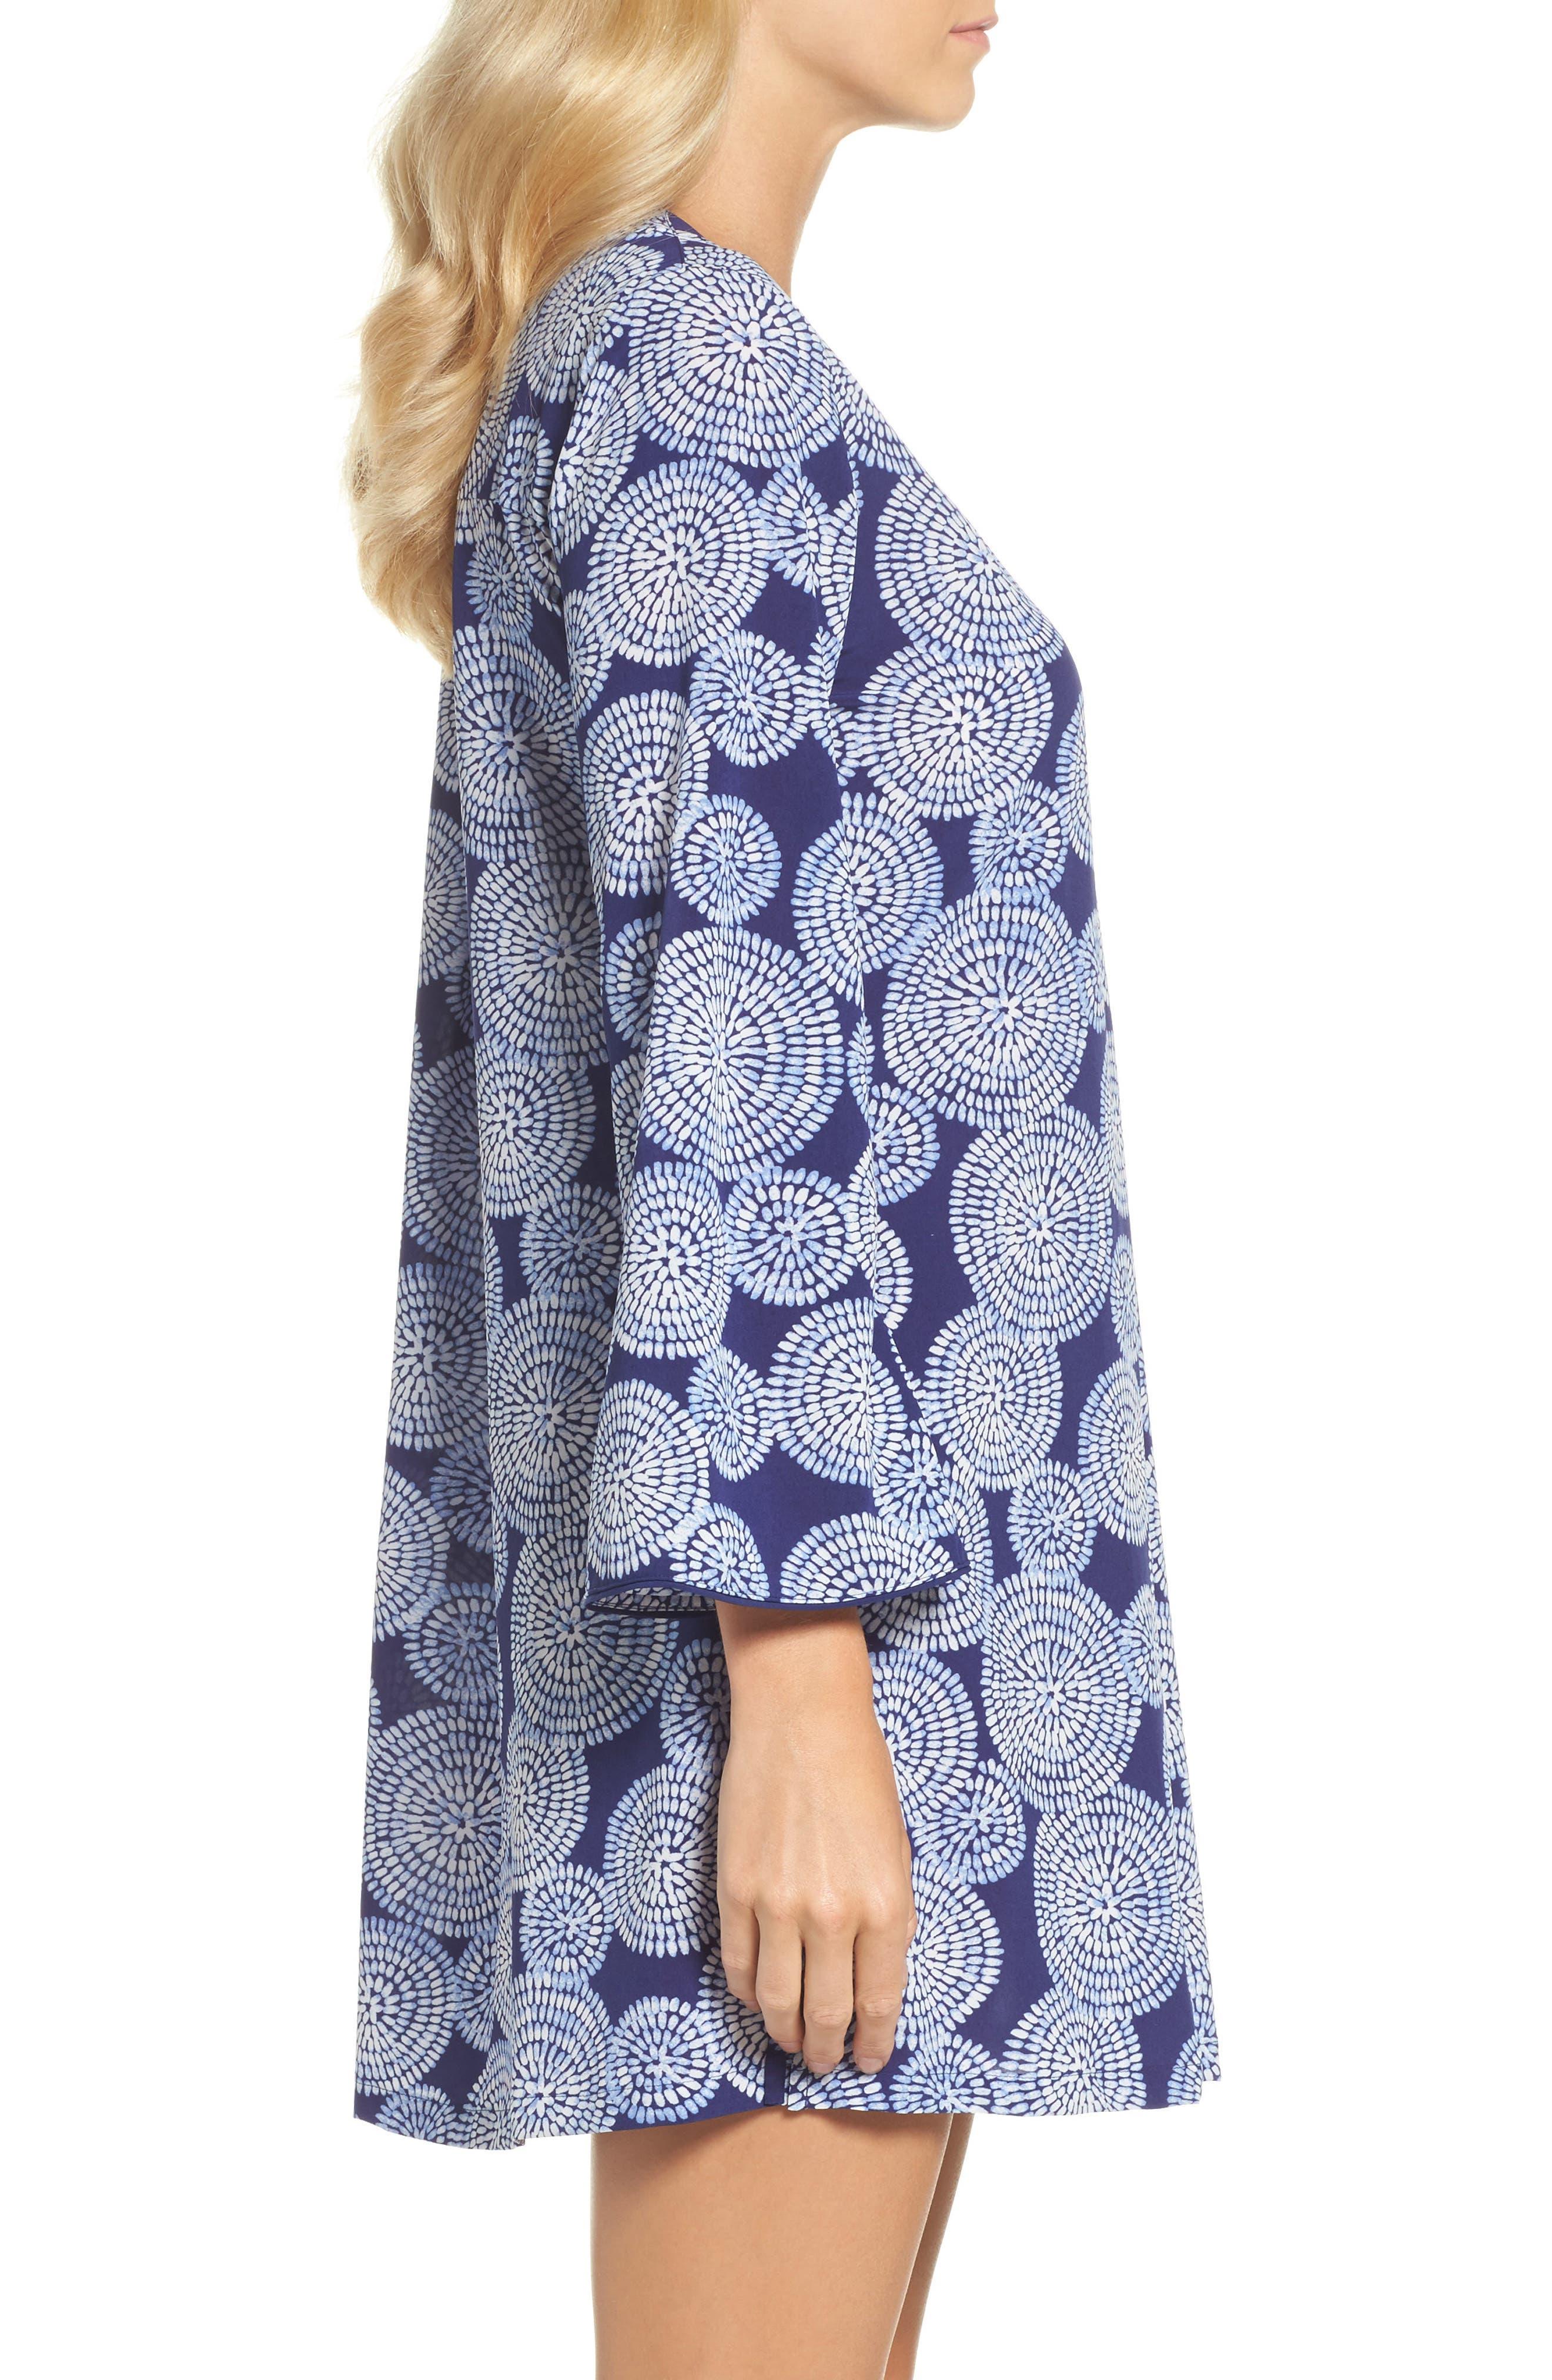 Sleepwear Halftan Short Nightgown,                             Alternate thumbnail 3, color,                             498